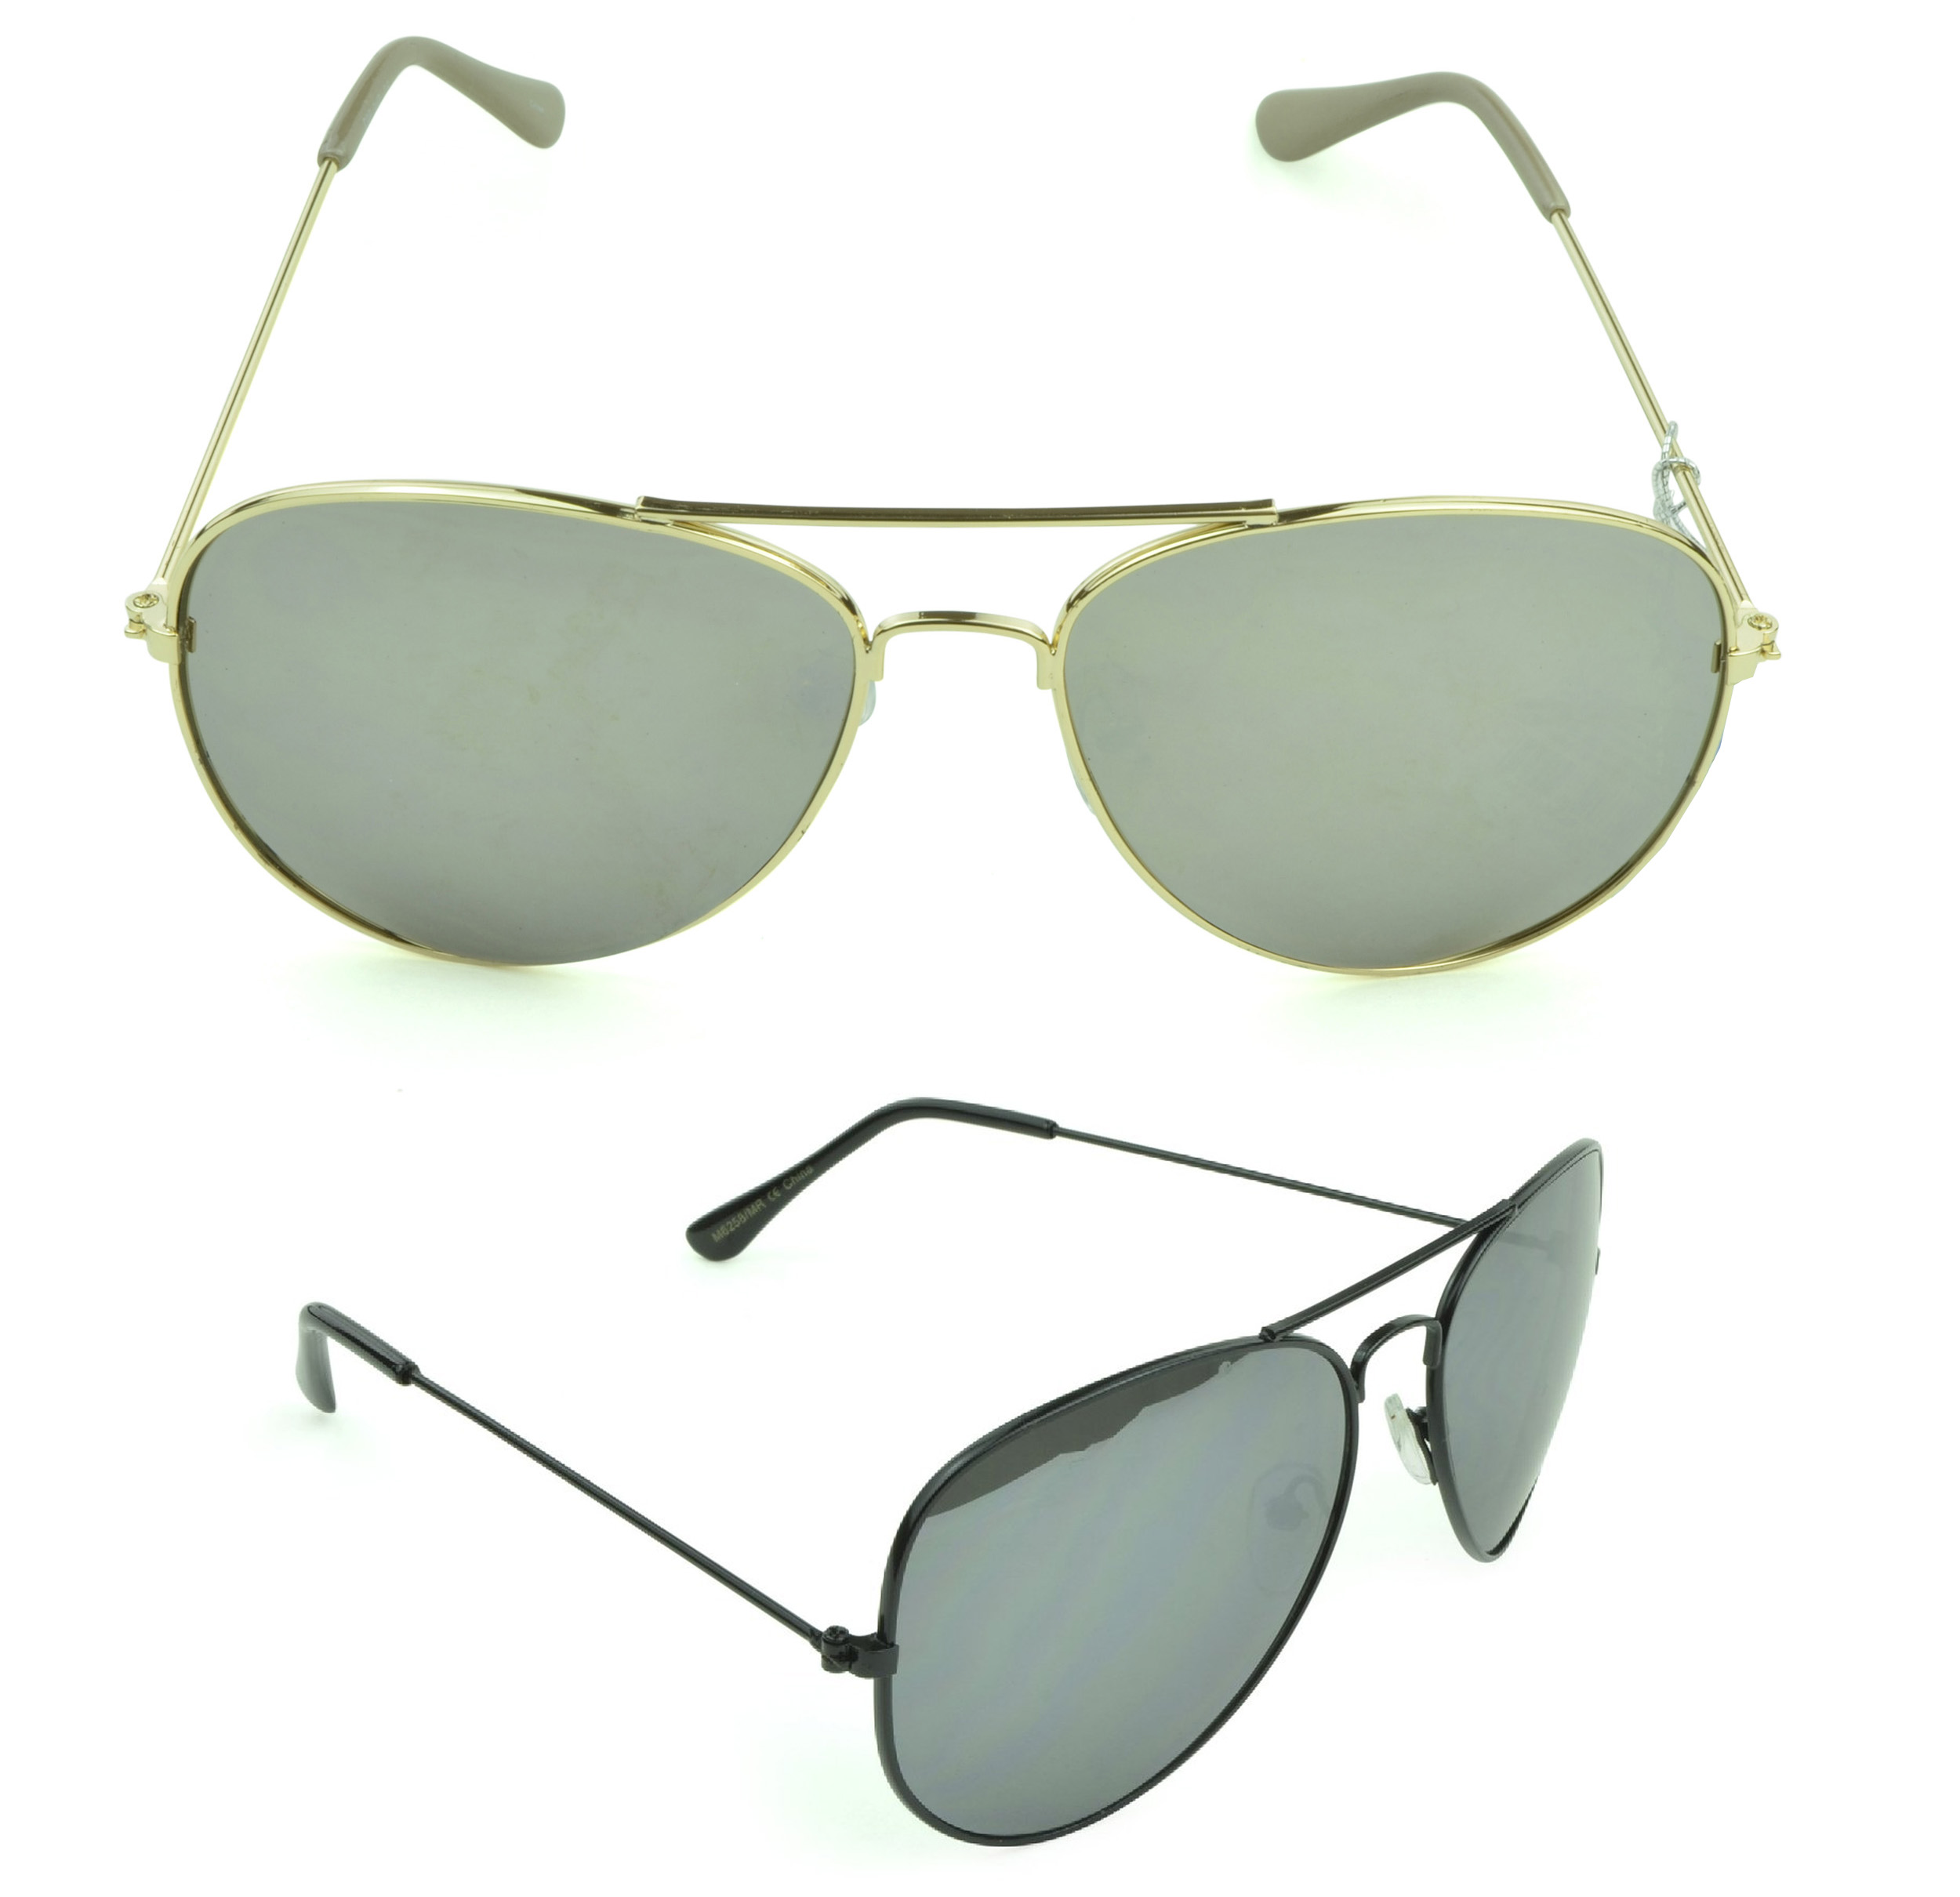 BD- Trendy Classic Aviator Sunglasses Men / Women Sunglasses 100% UV Protection